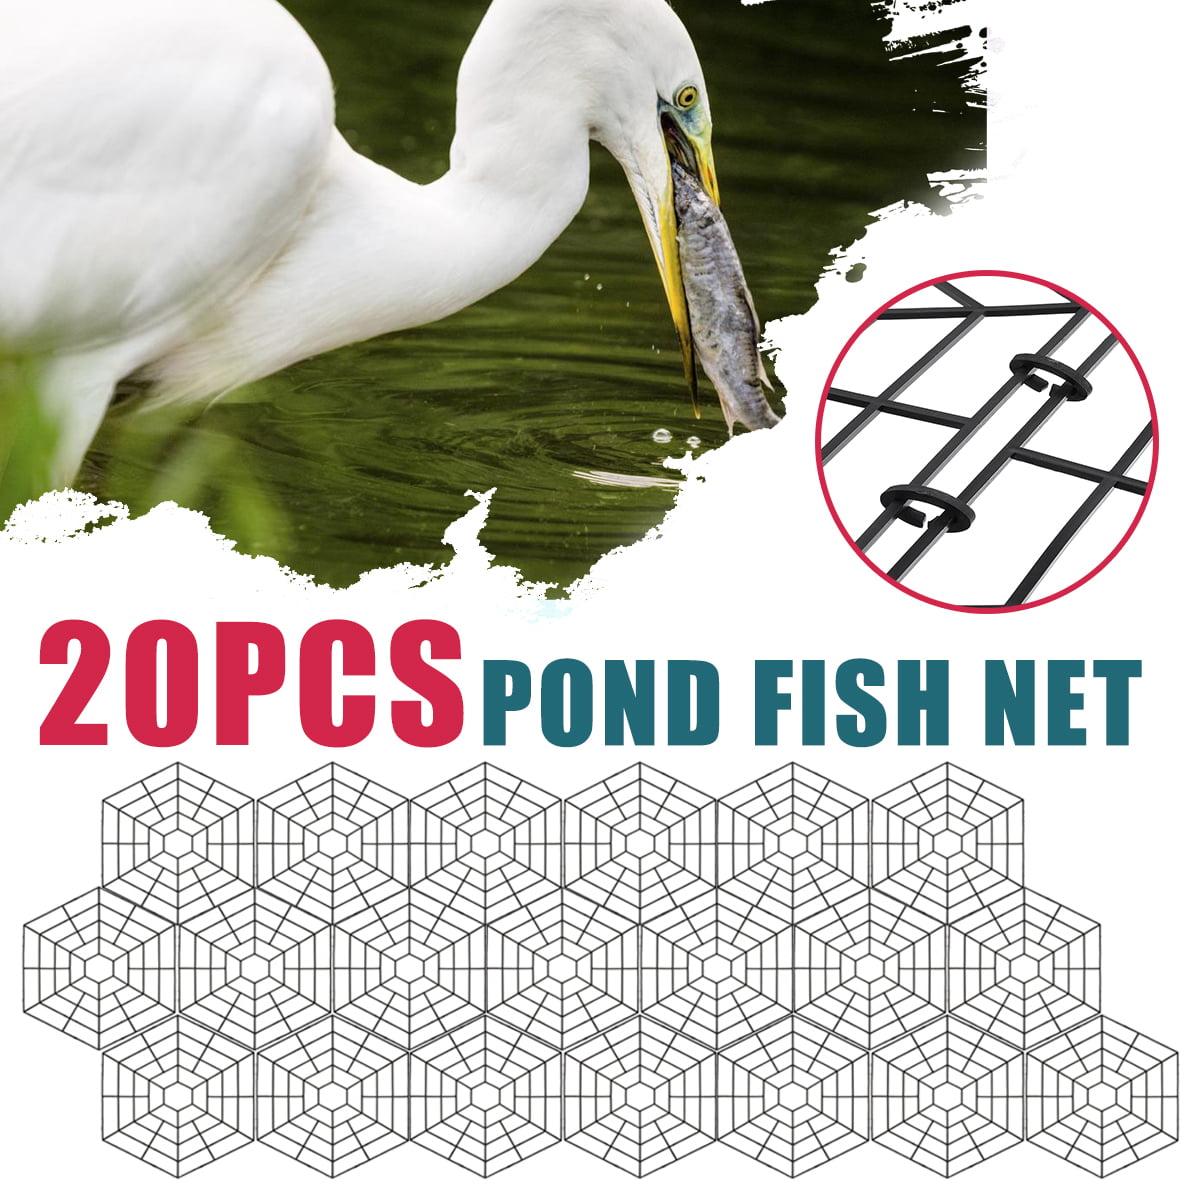 30pcs Pond Protectors Floating Guard Against Heron Lightweight Plastic Net